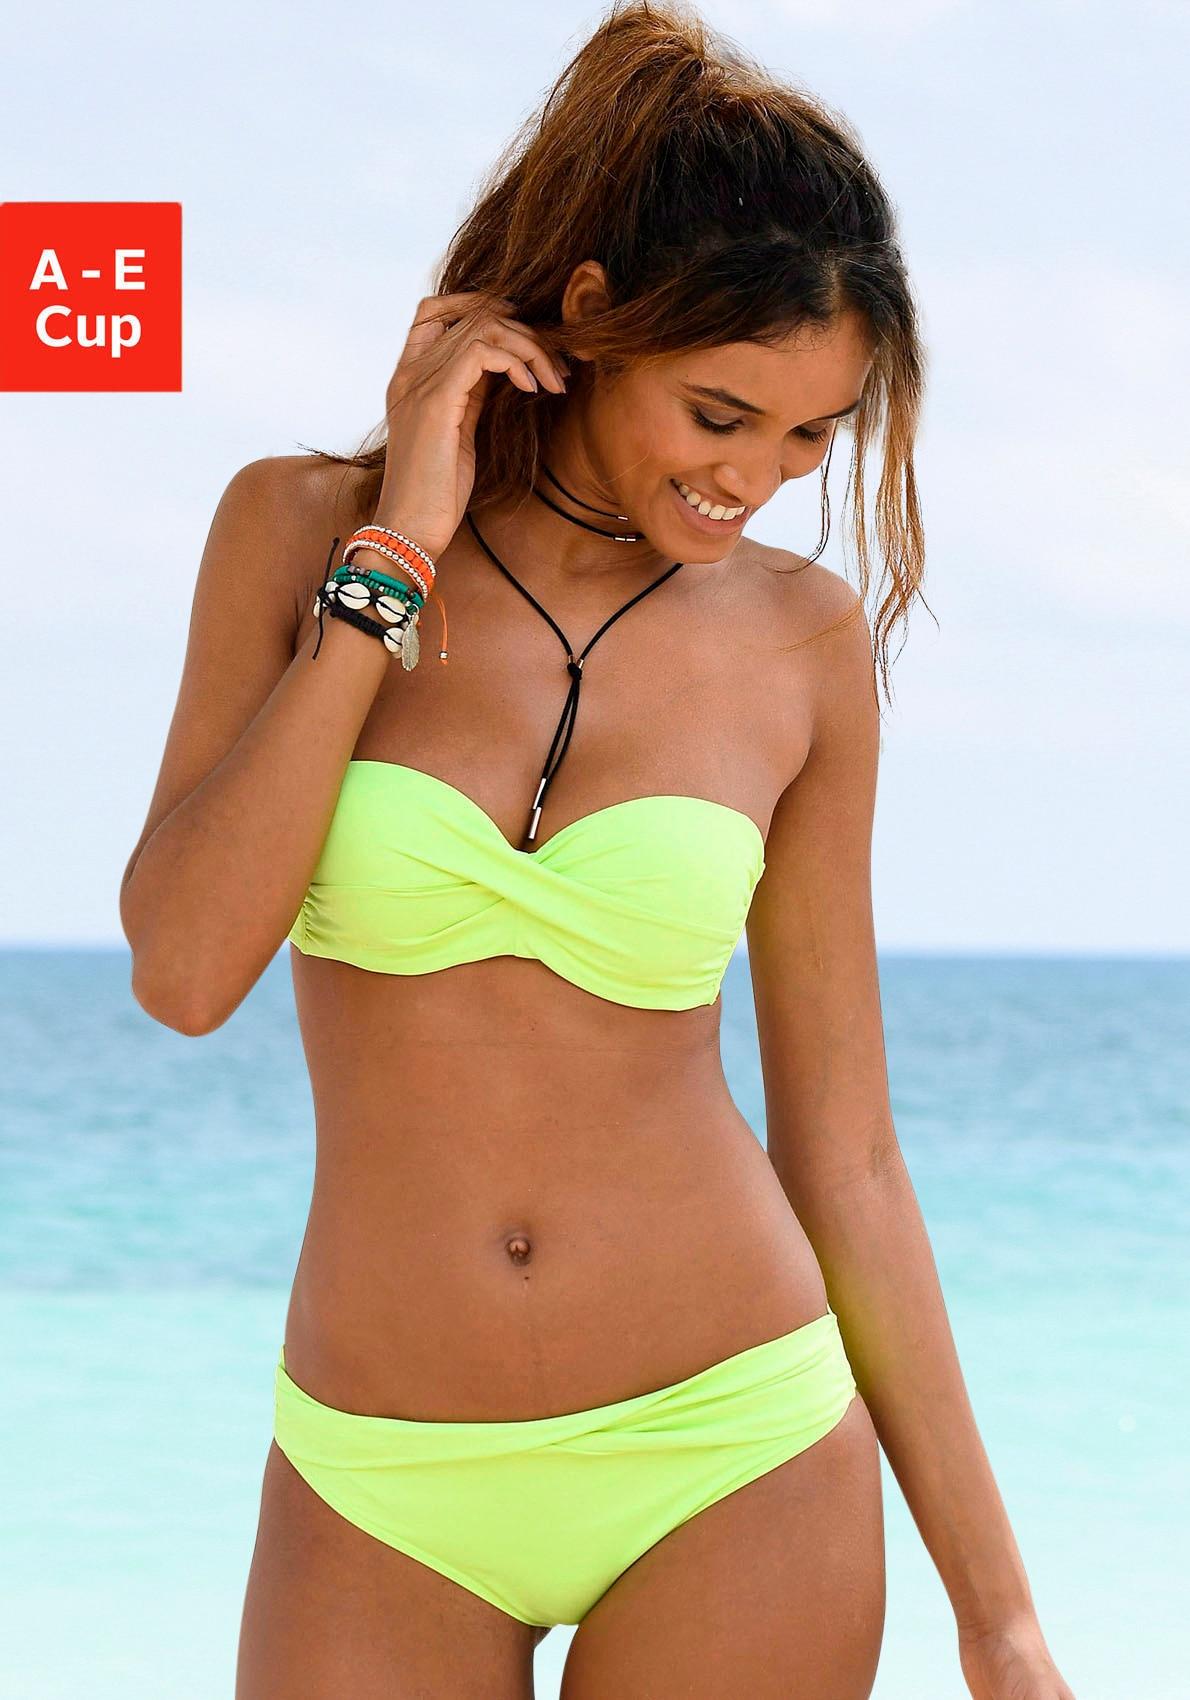 unifarben mit Wicke NEU OVP Damen s.Oliver Beachwear Bandeau-Bikini-Top »Spain«